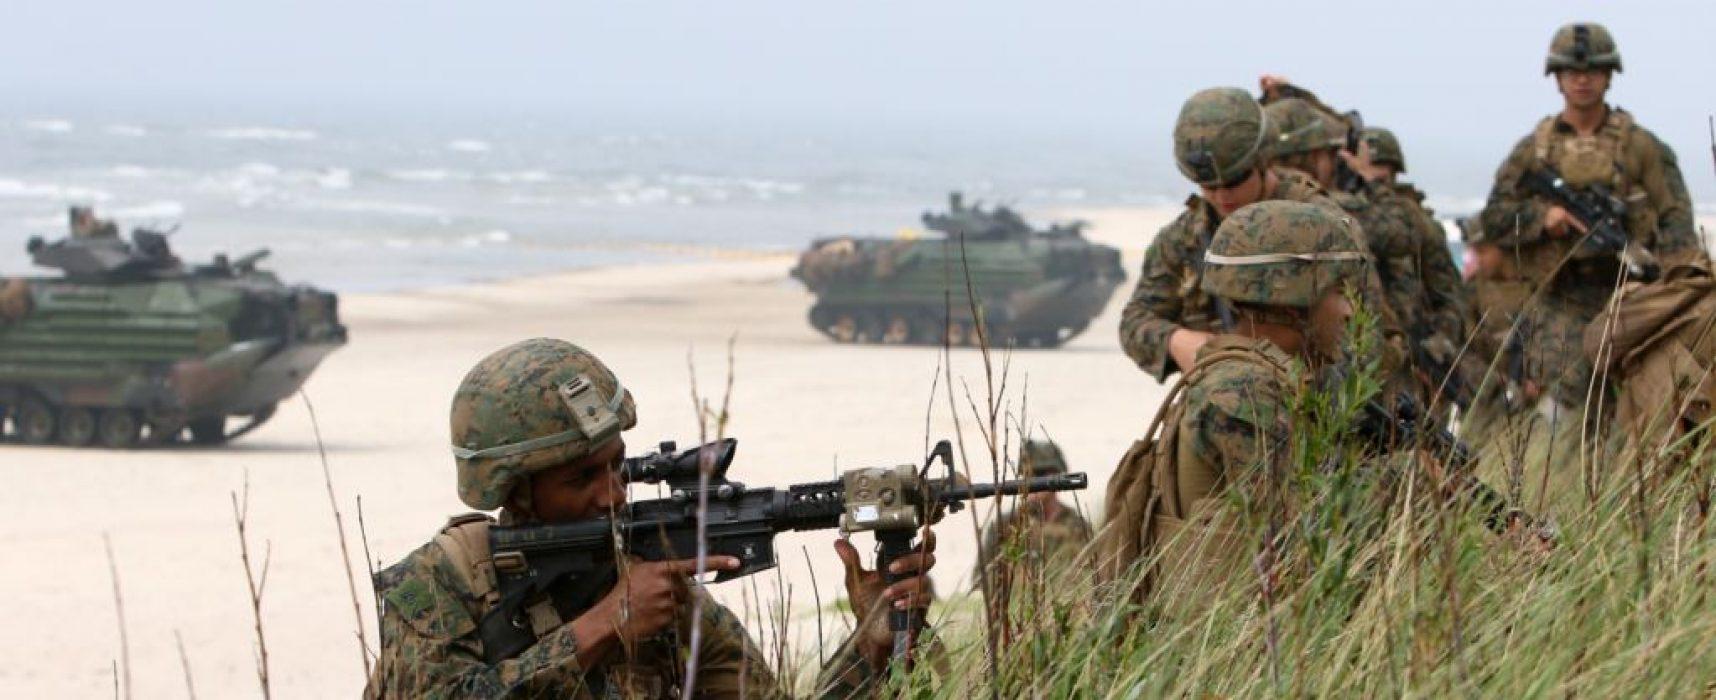 NATO isn't planning to break up Russia